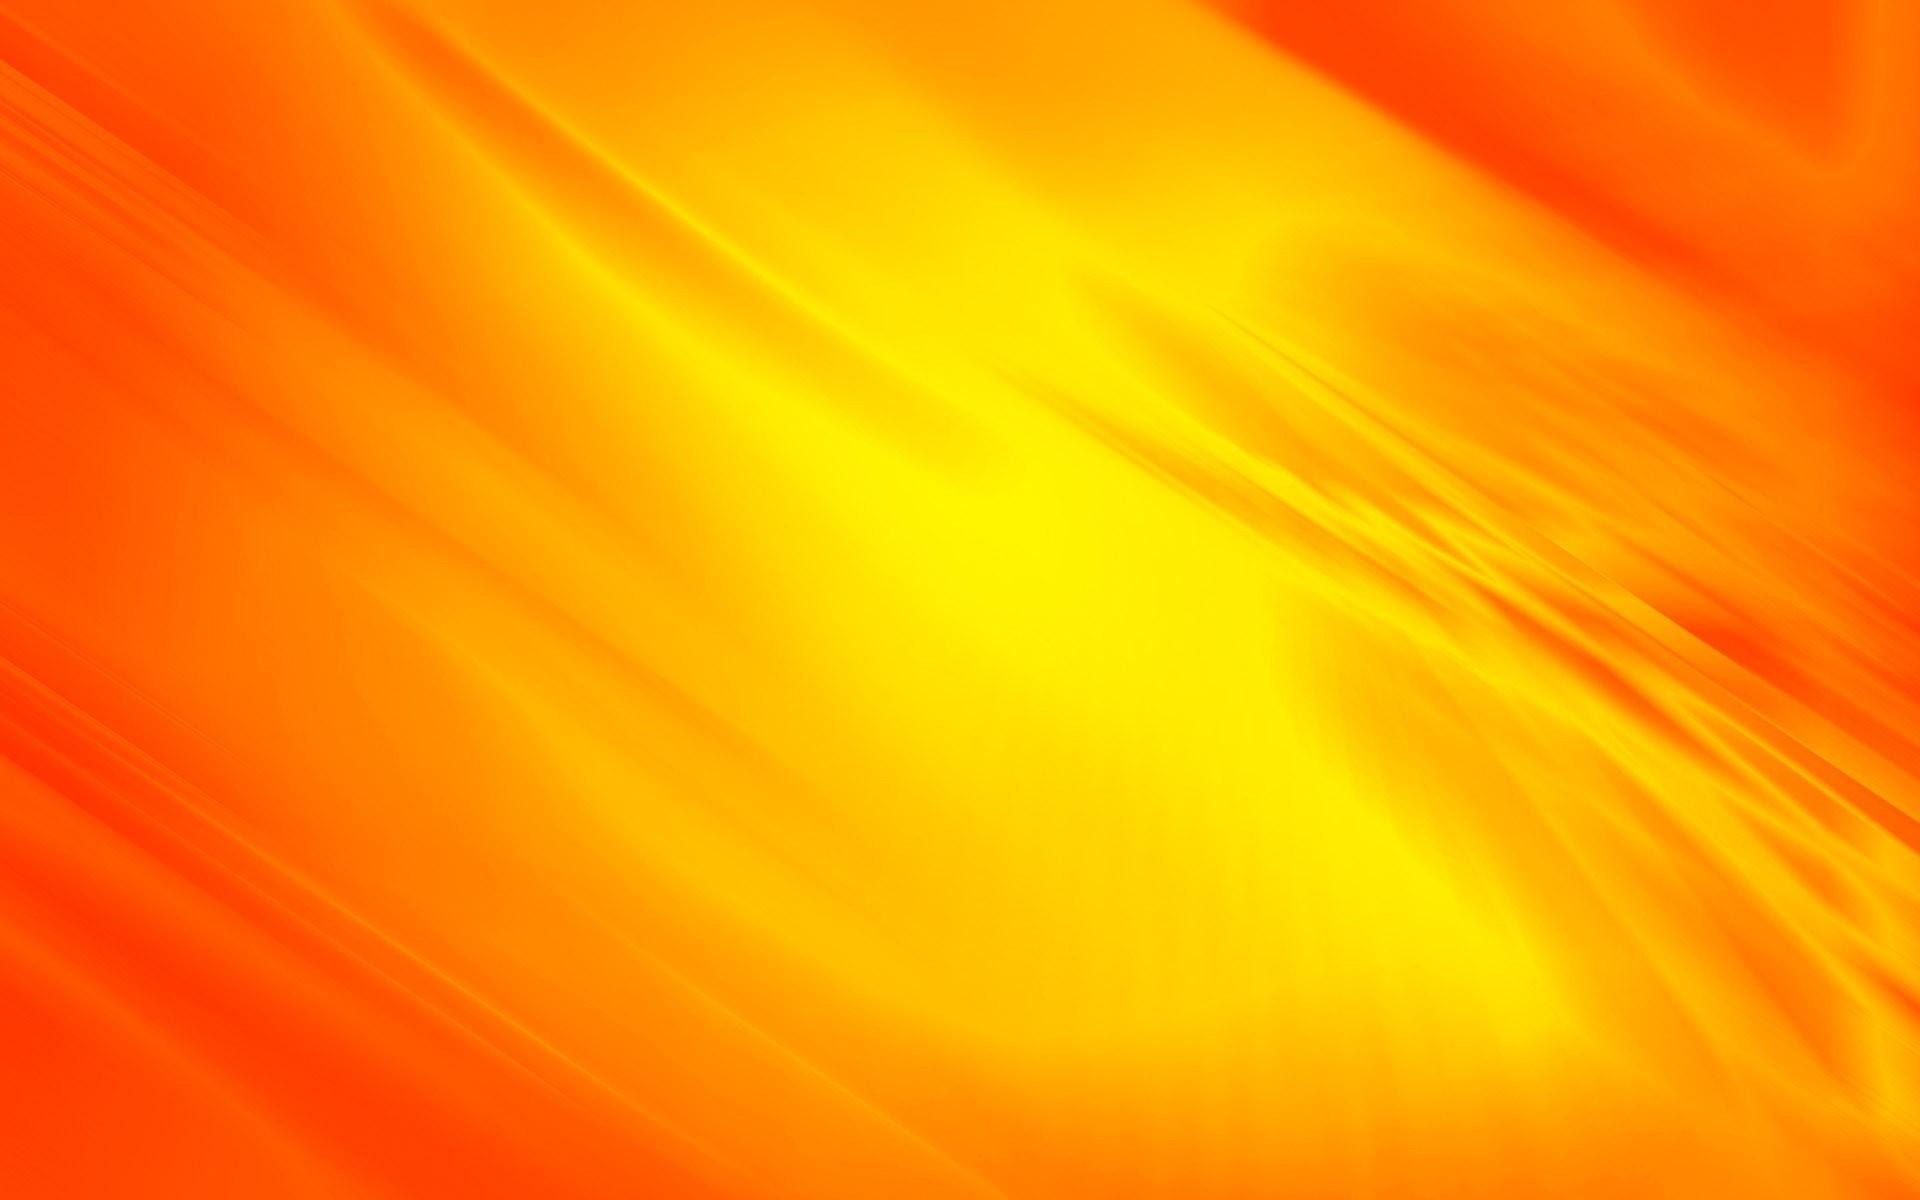 Yellow orange flowing curves wallpaper 7292 1920x1200